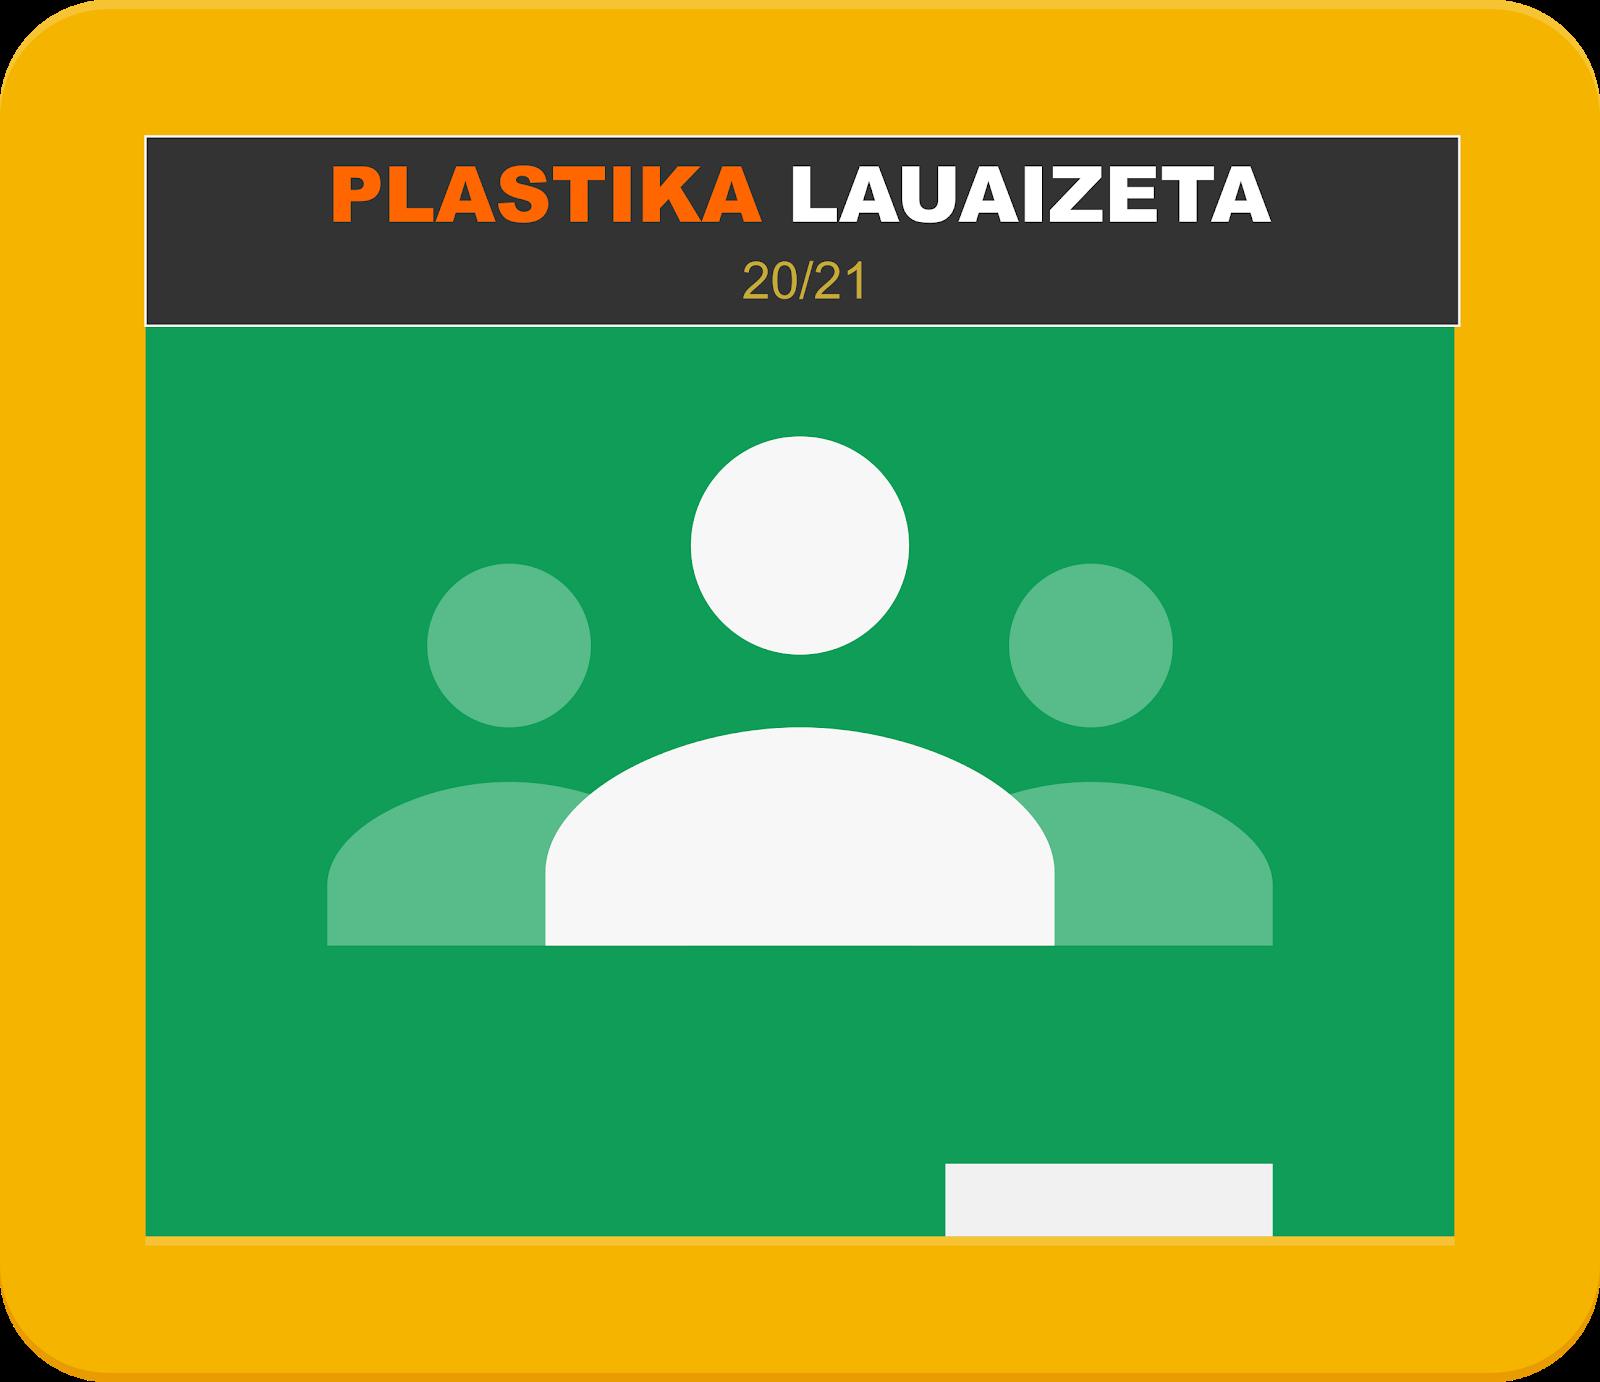 CLASSROOM PLASTIKA